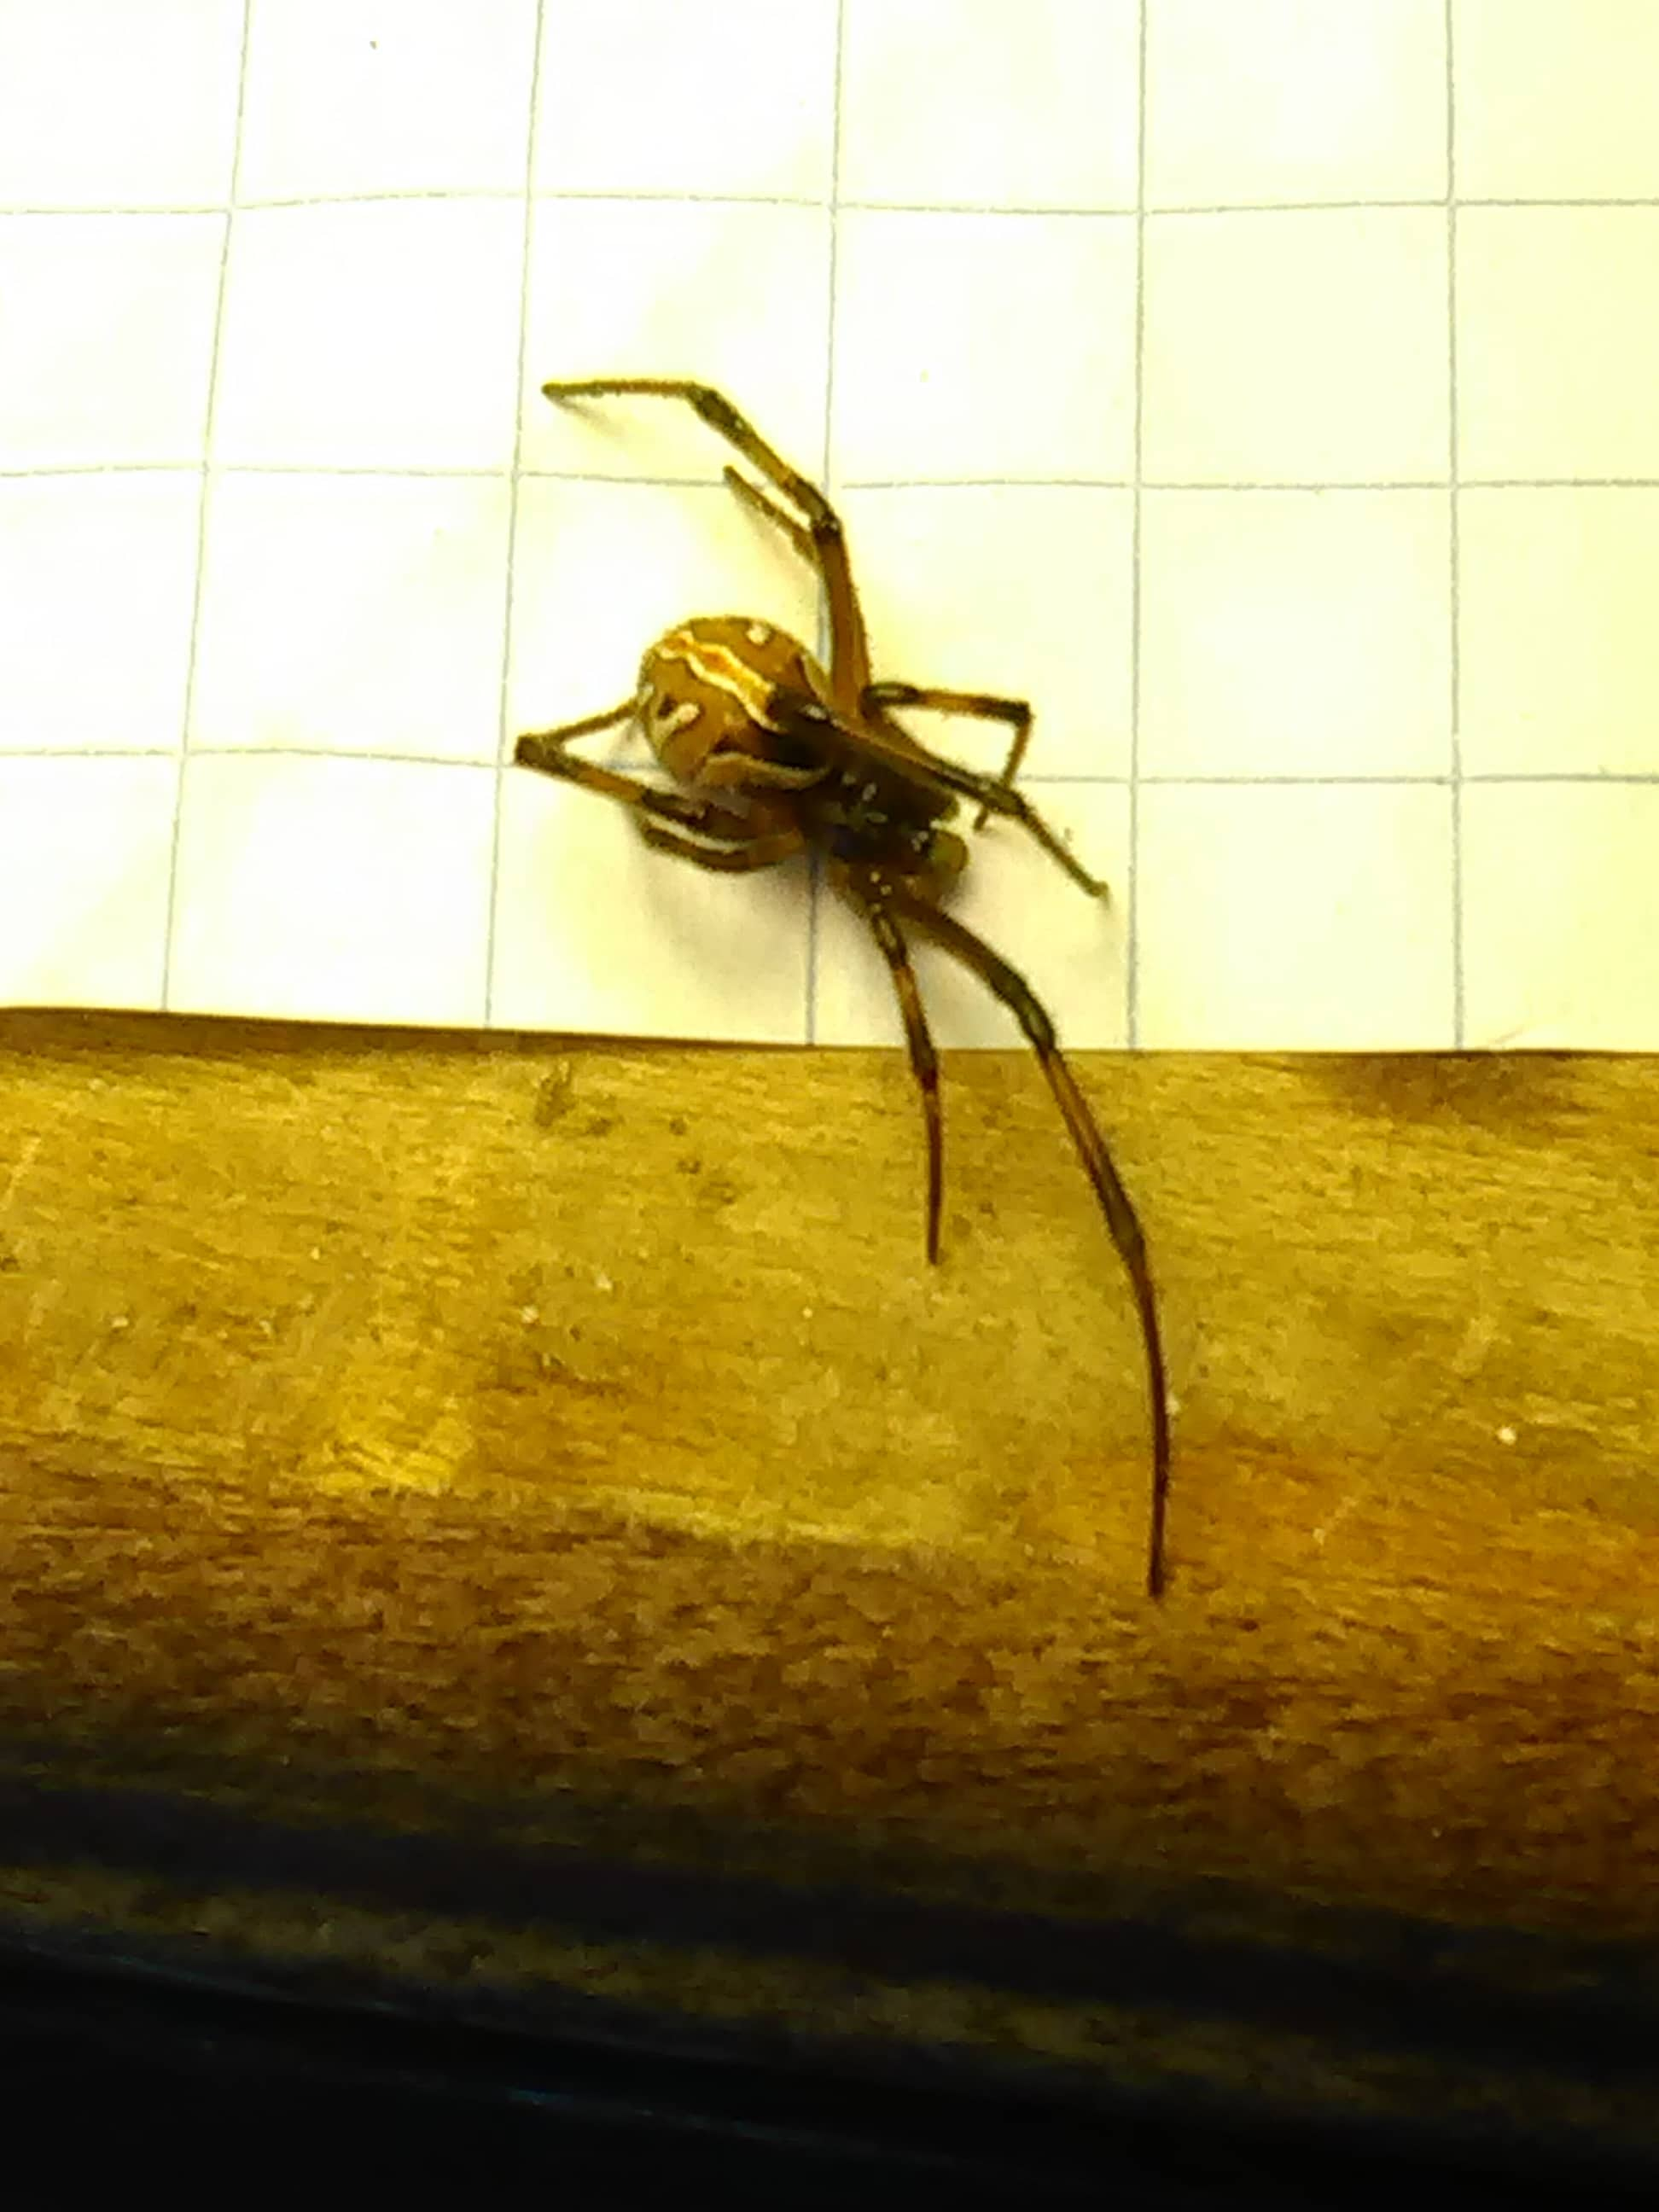 Picture of Latrodectus hesperus (Western Black Widow) - Male - Dorsal,Penultimate